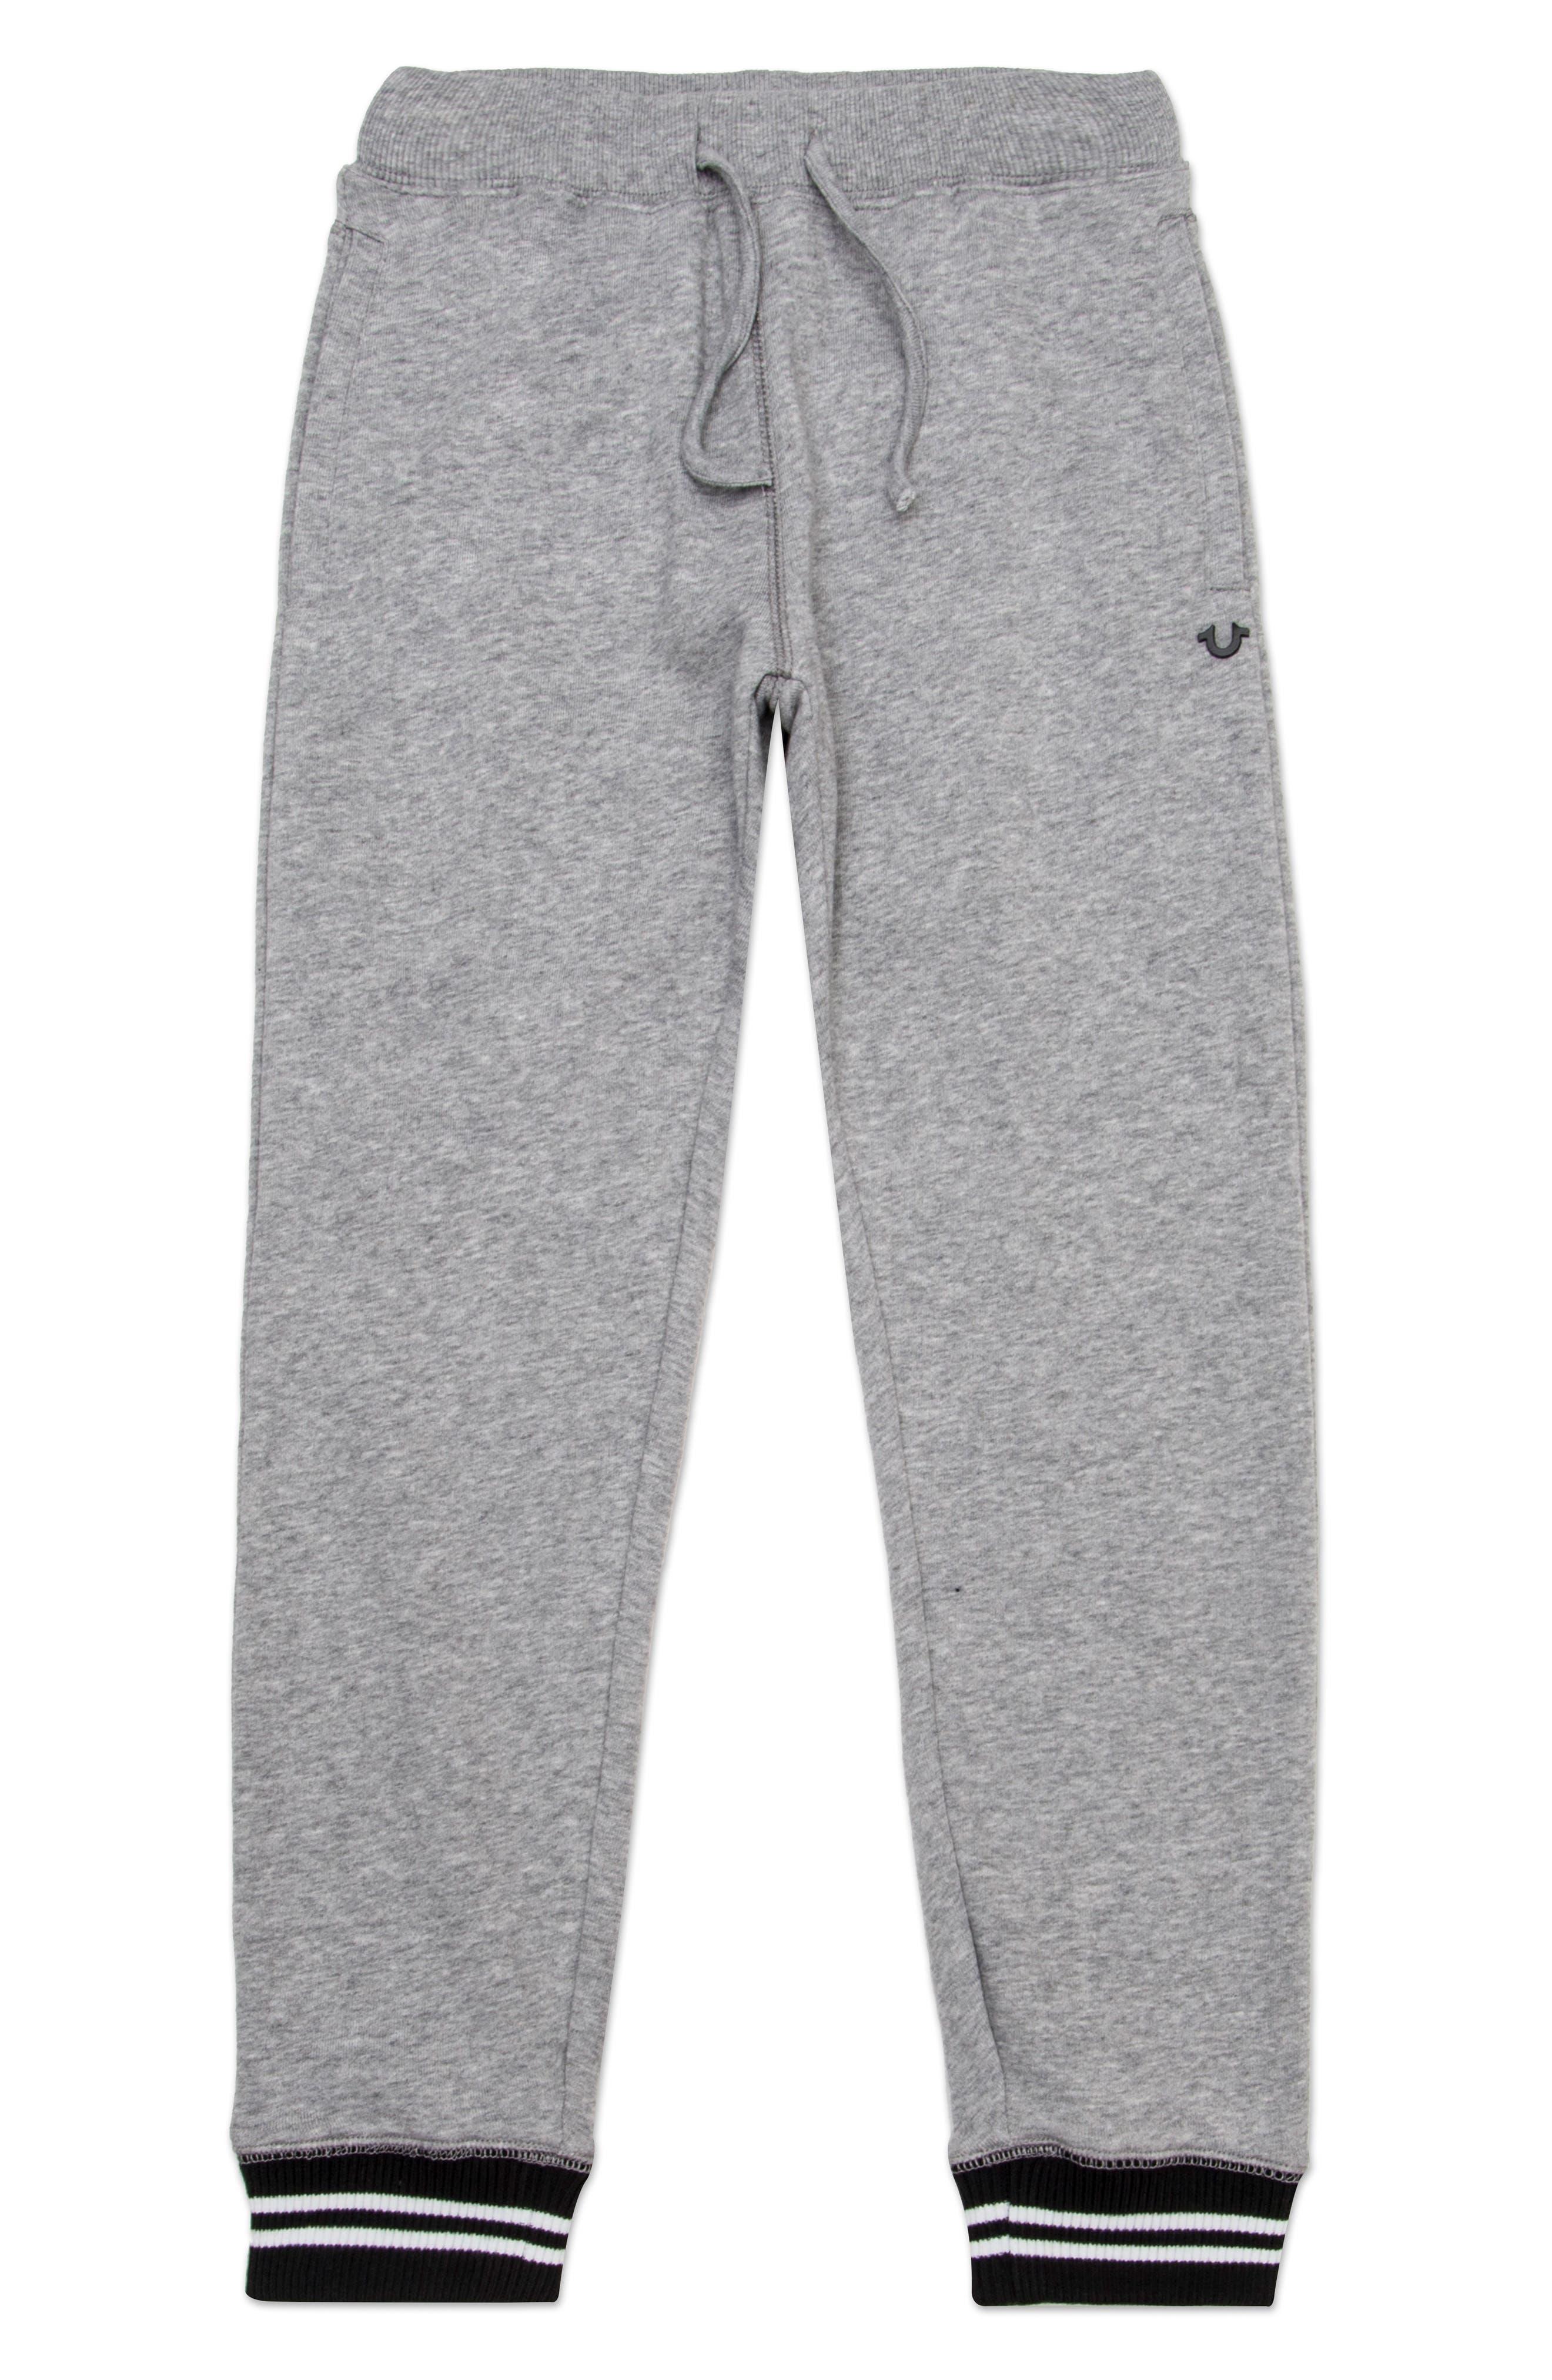 True Religion Brand Jeans Tipped Sweatpants (Toddler Boys & Little Boys)